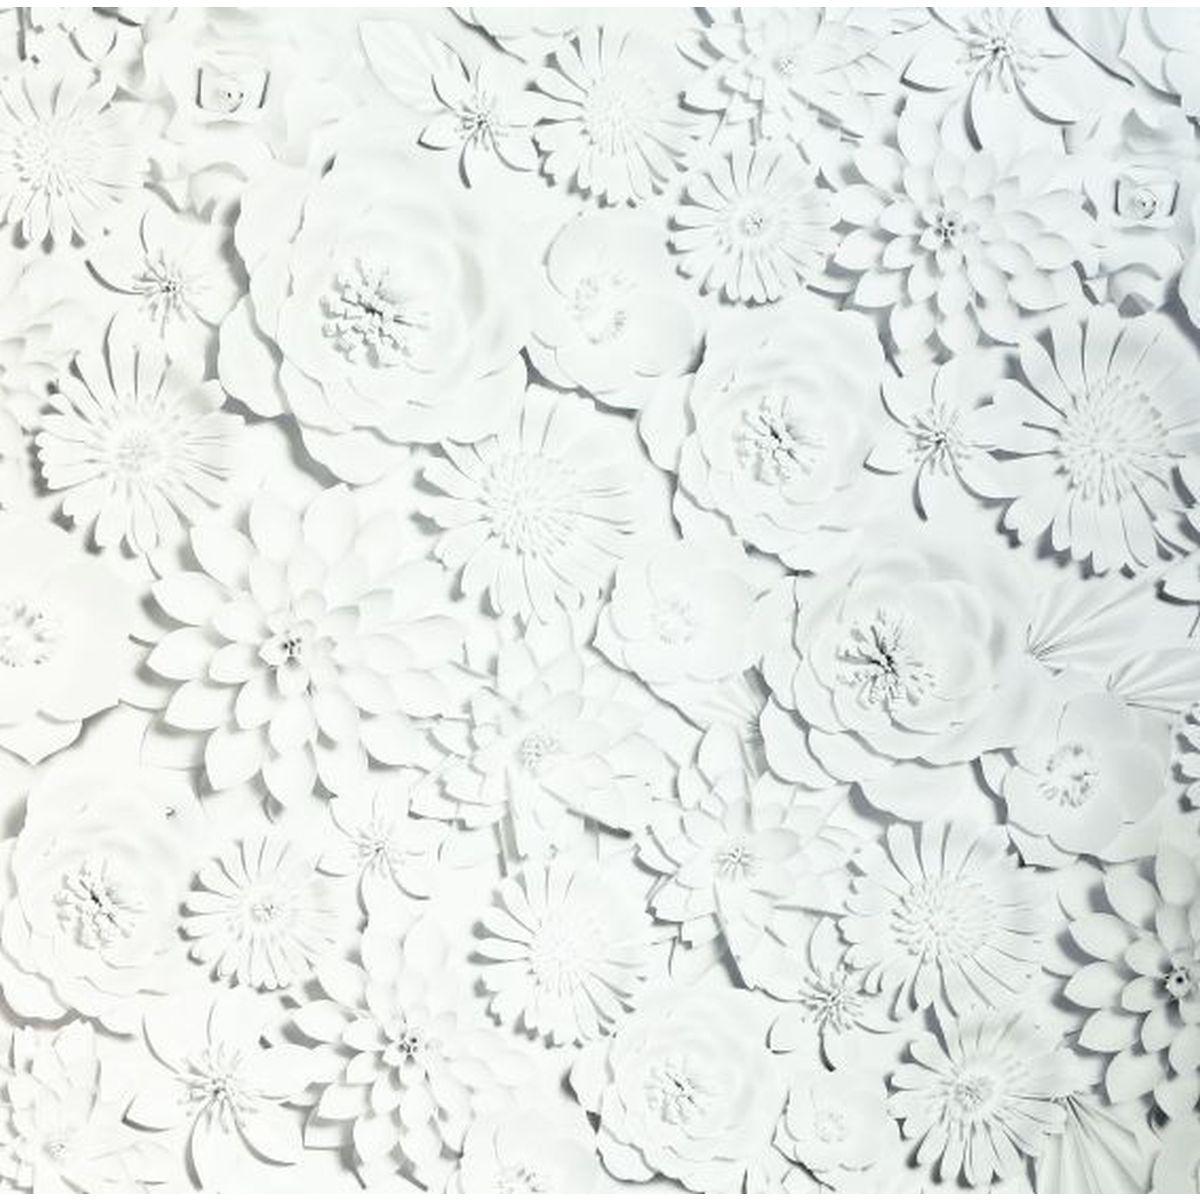 Best of Arthouse Vliestapete Edle Tapete 907603 Weiß Blumentapete